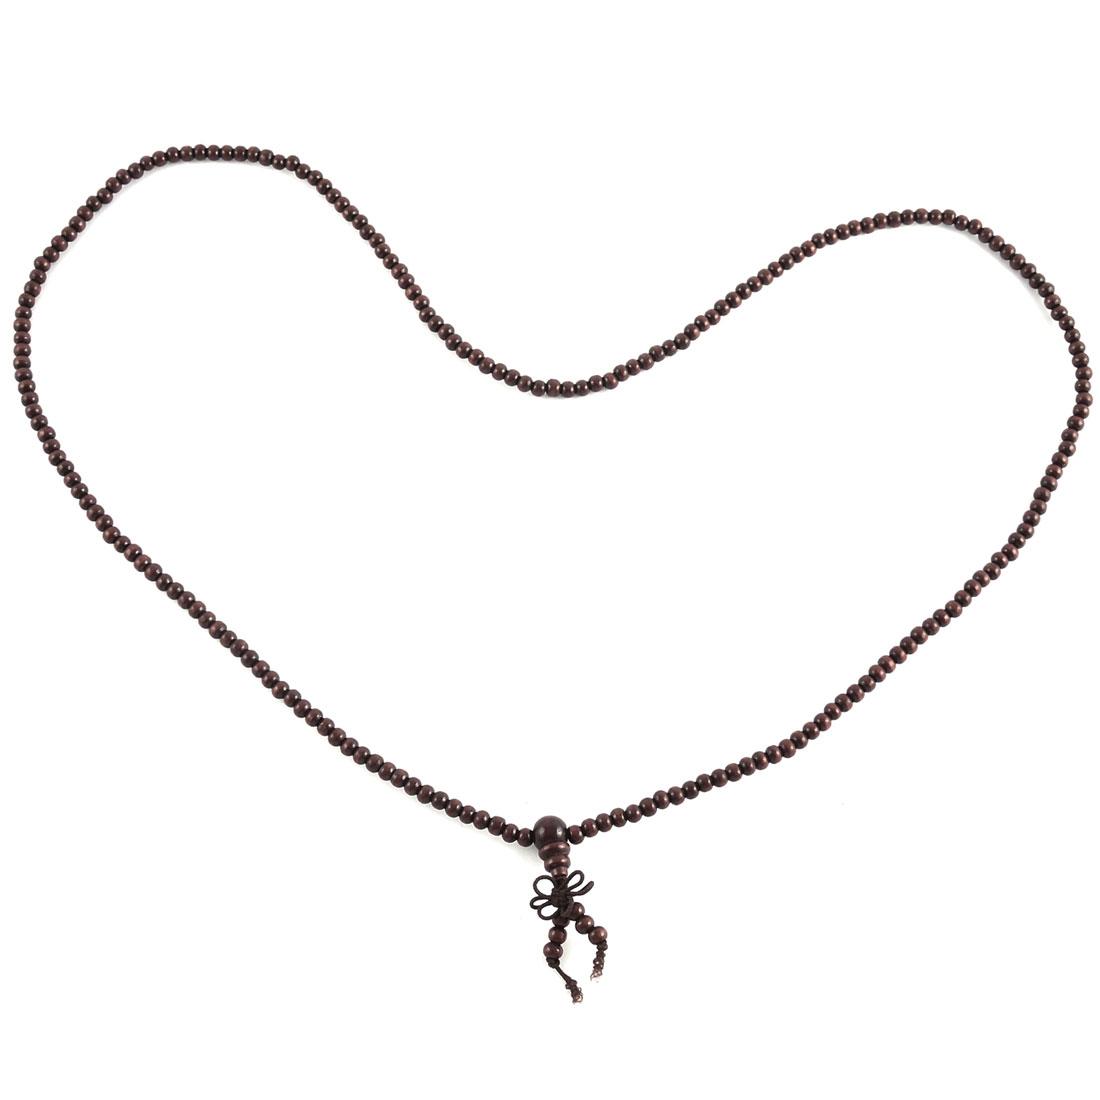 Wood Round Prayer Beads Stretch Strap Necklace Chain Bracelet Burgundy